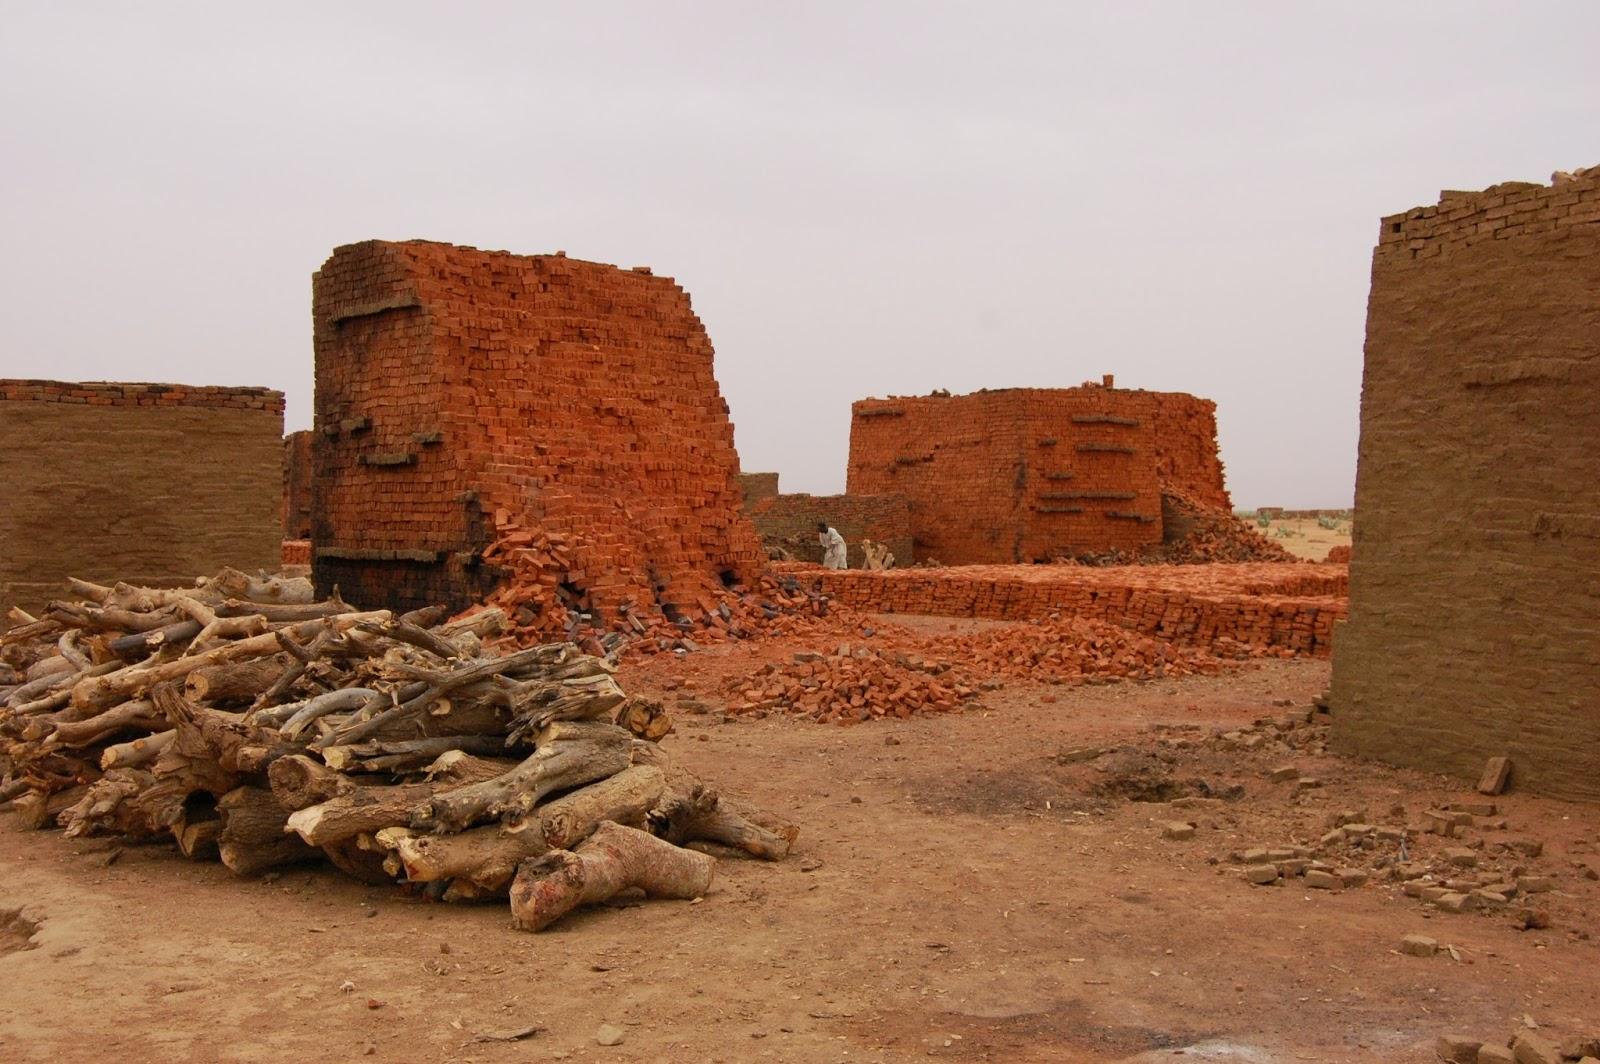 The Brick Kilns